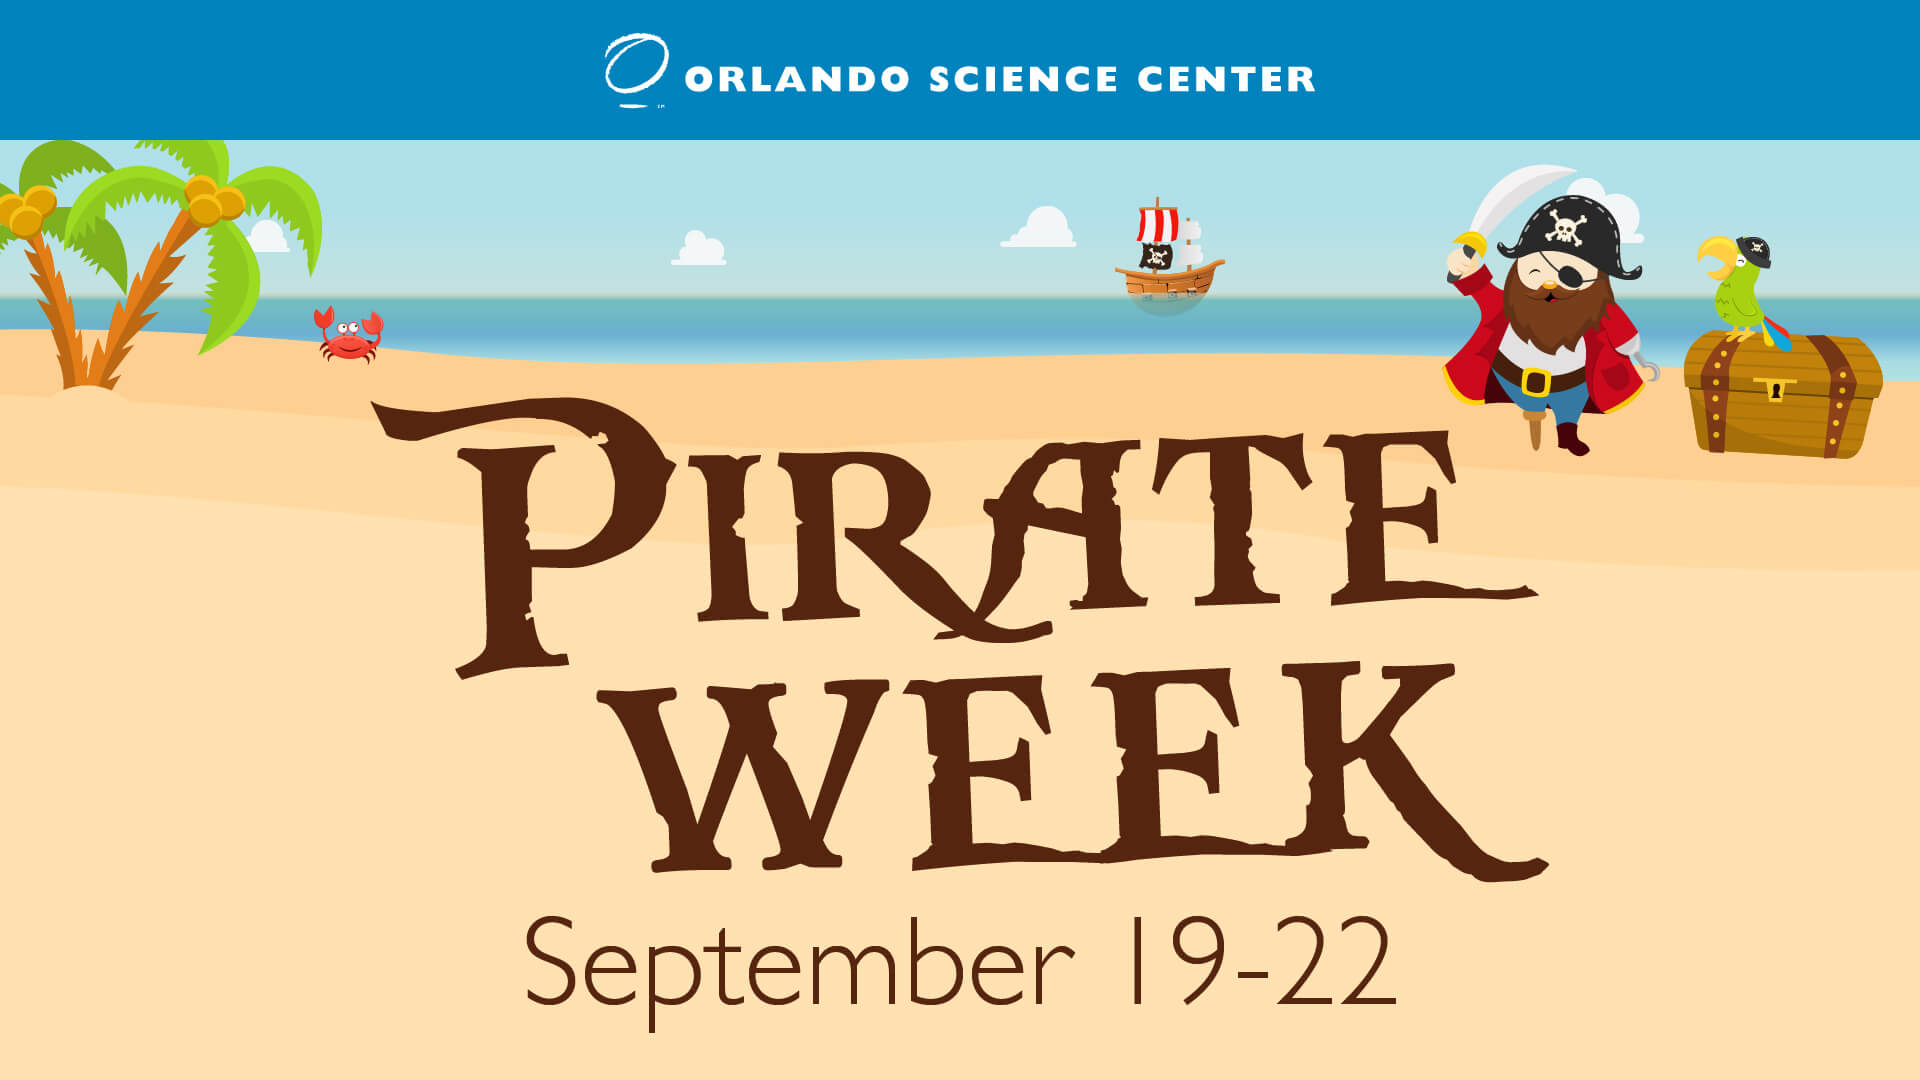 Pirate Week Flyer